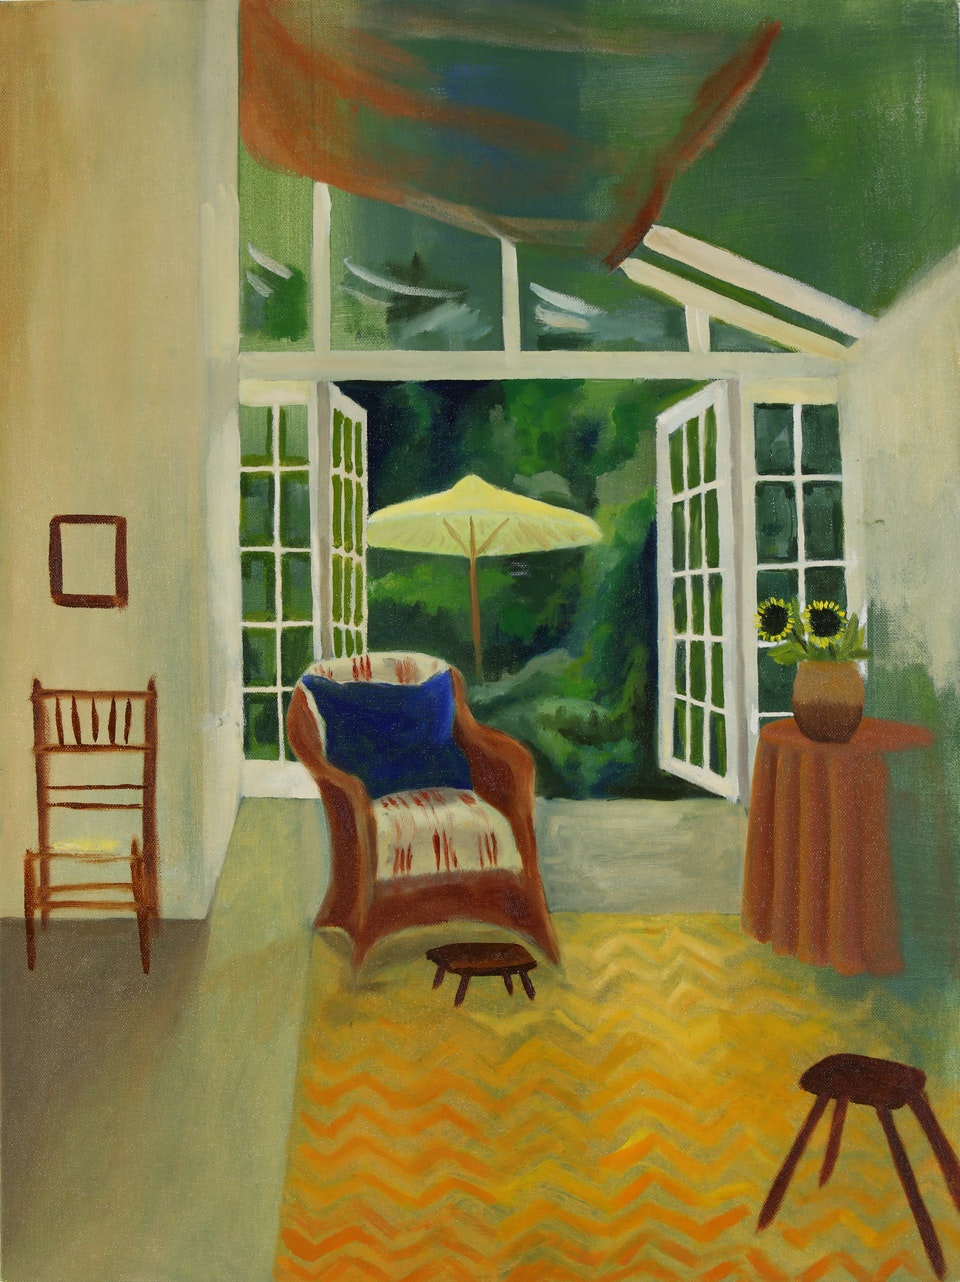 Interiors - Aviary:Conservatory - 2019